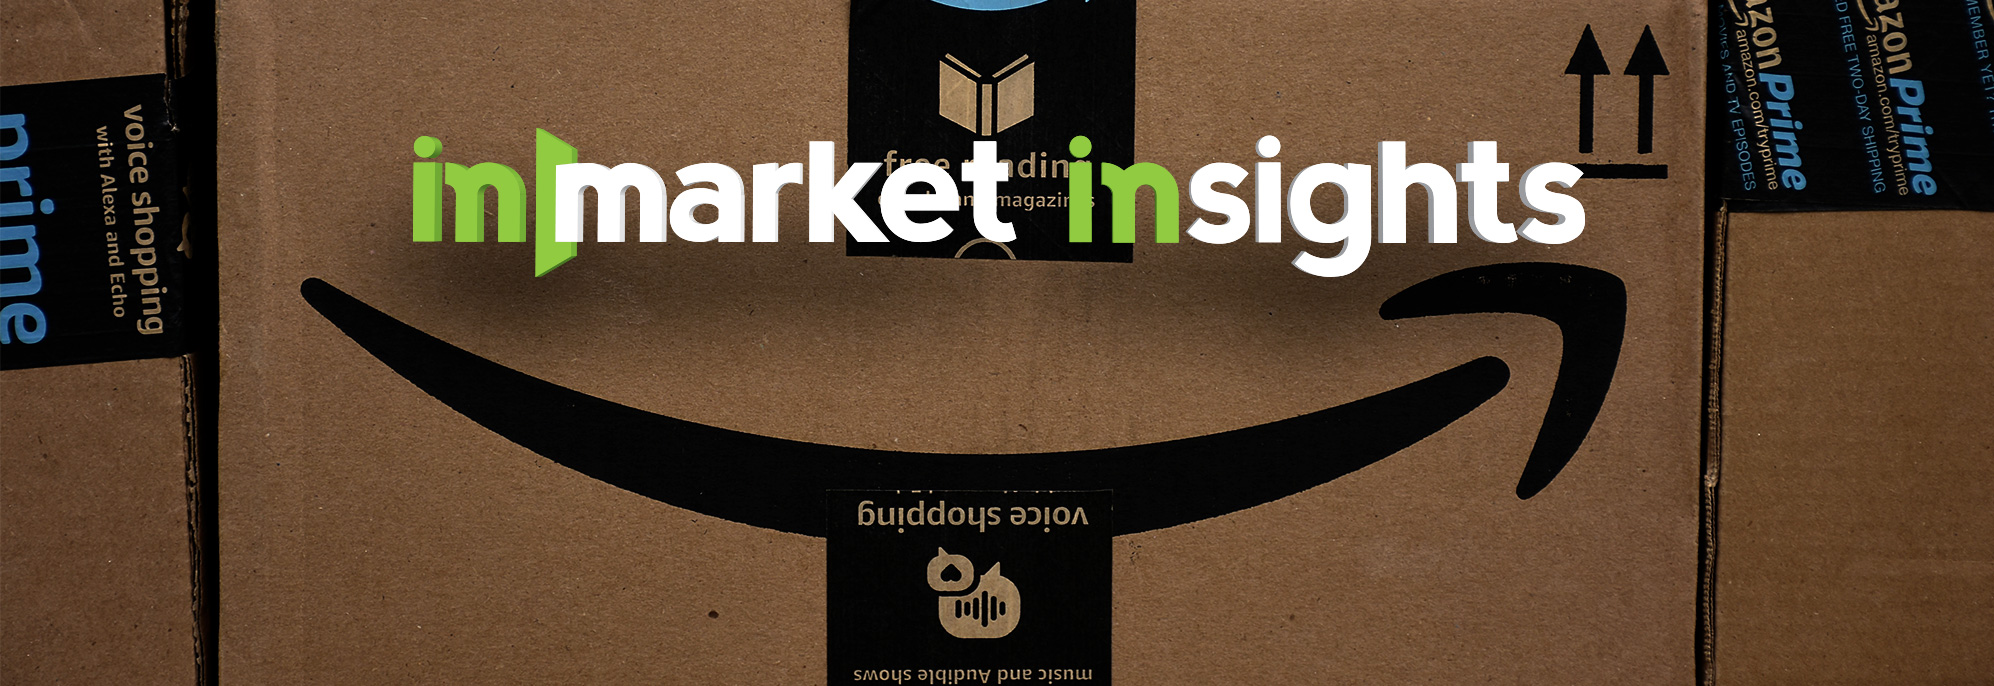 inMarket-inSights-amazon